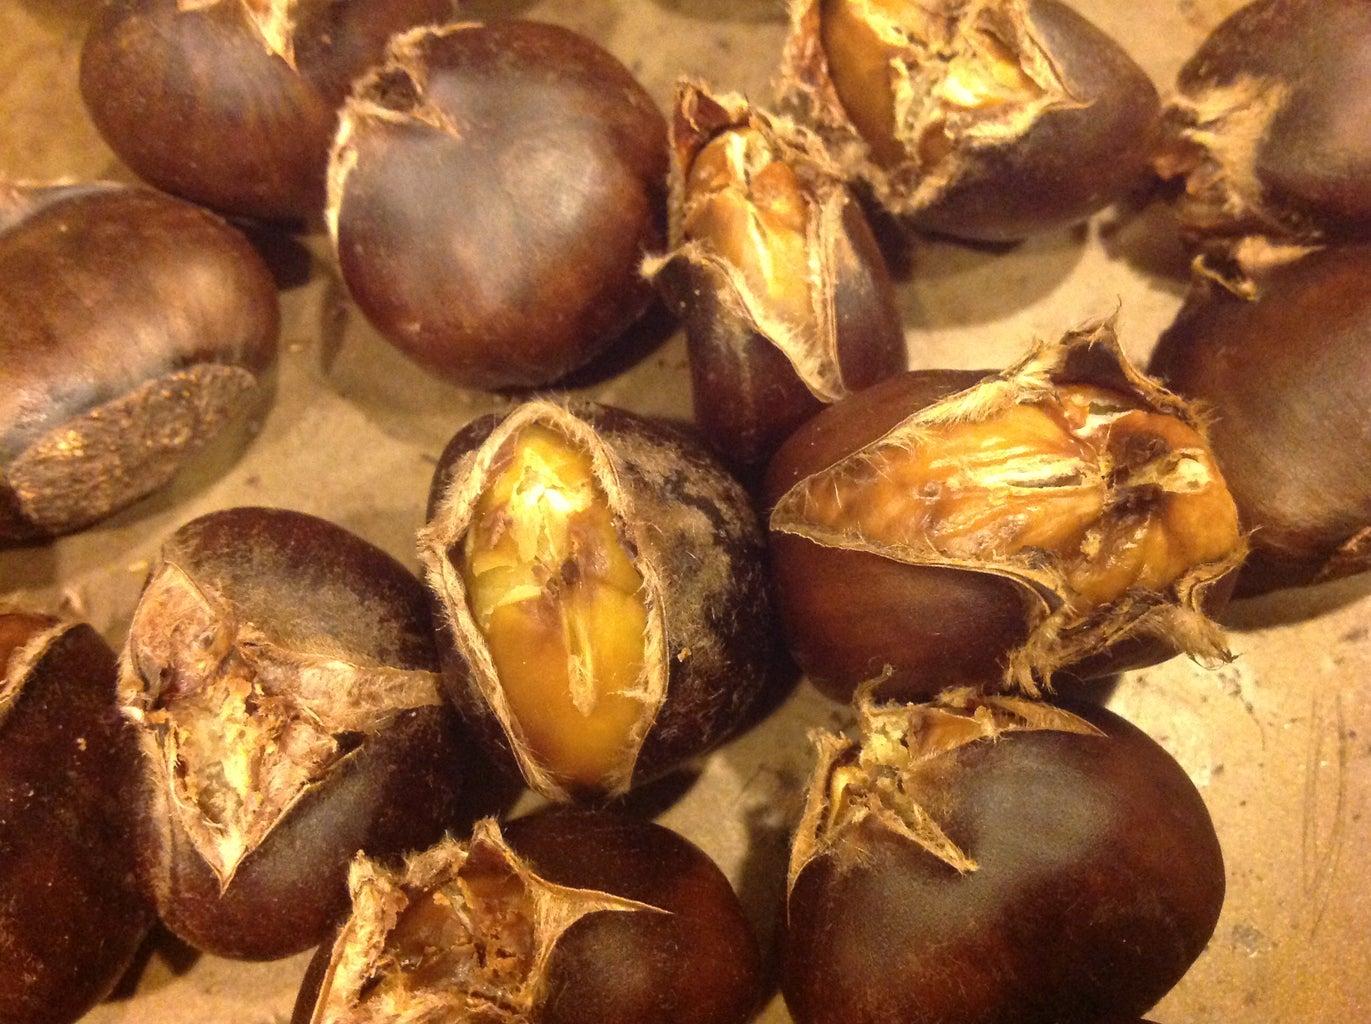 Spectacular Roasting Chestnut Explosion